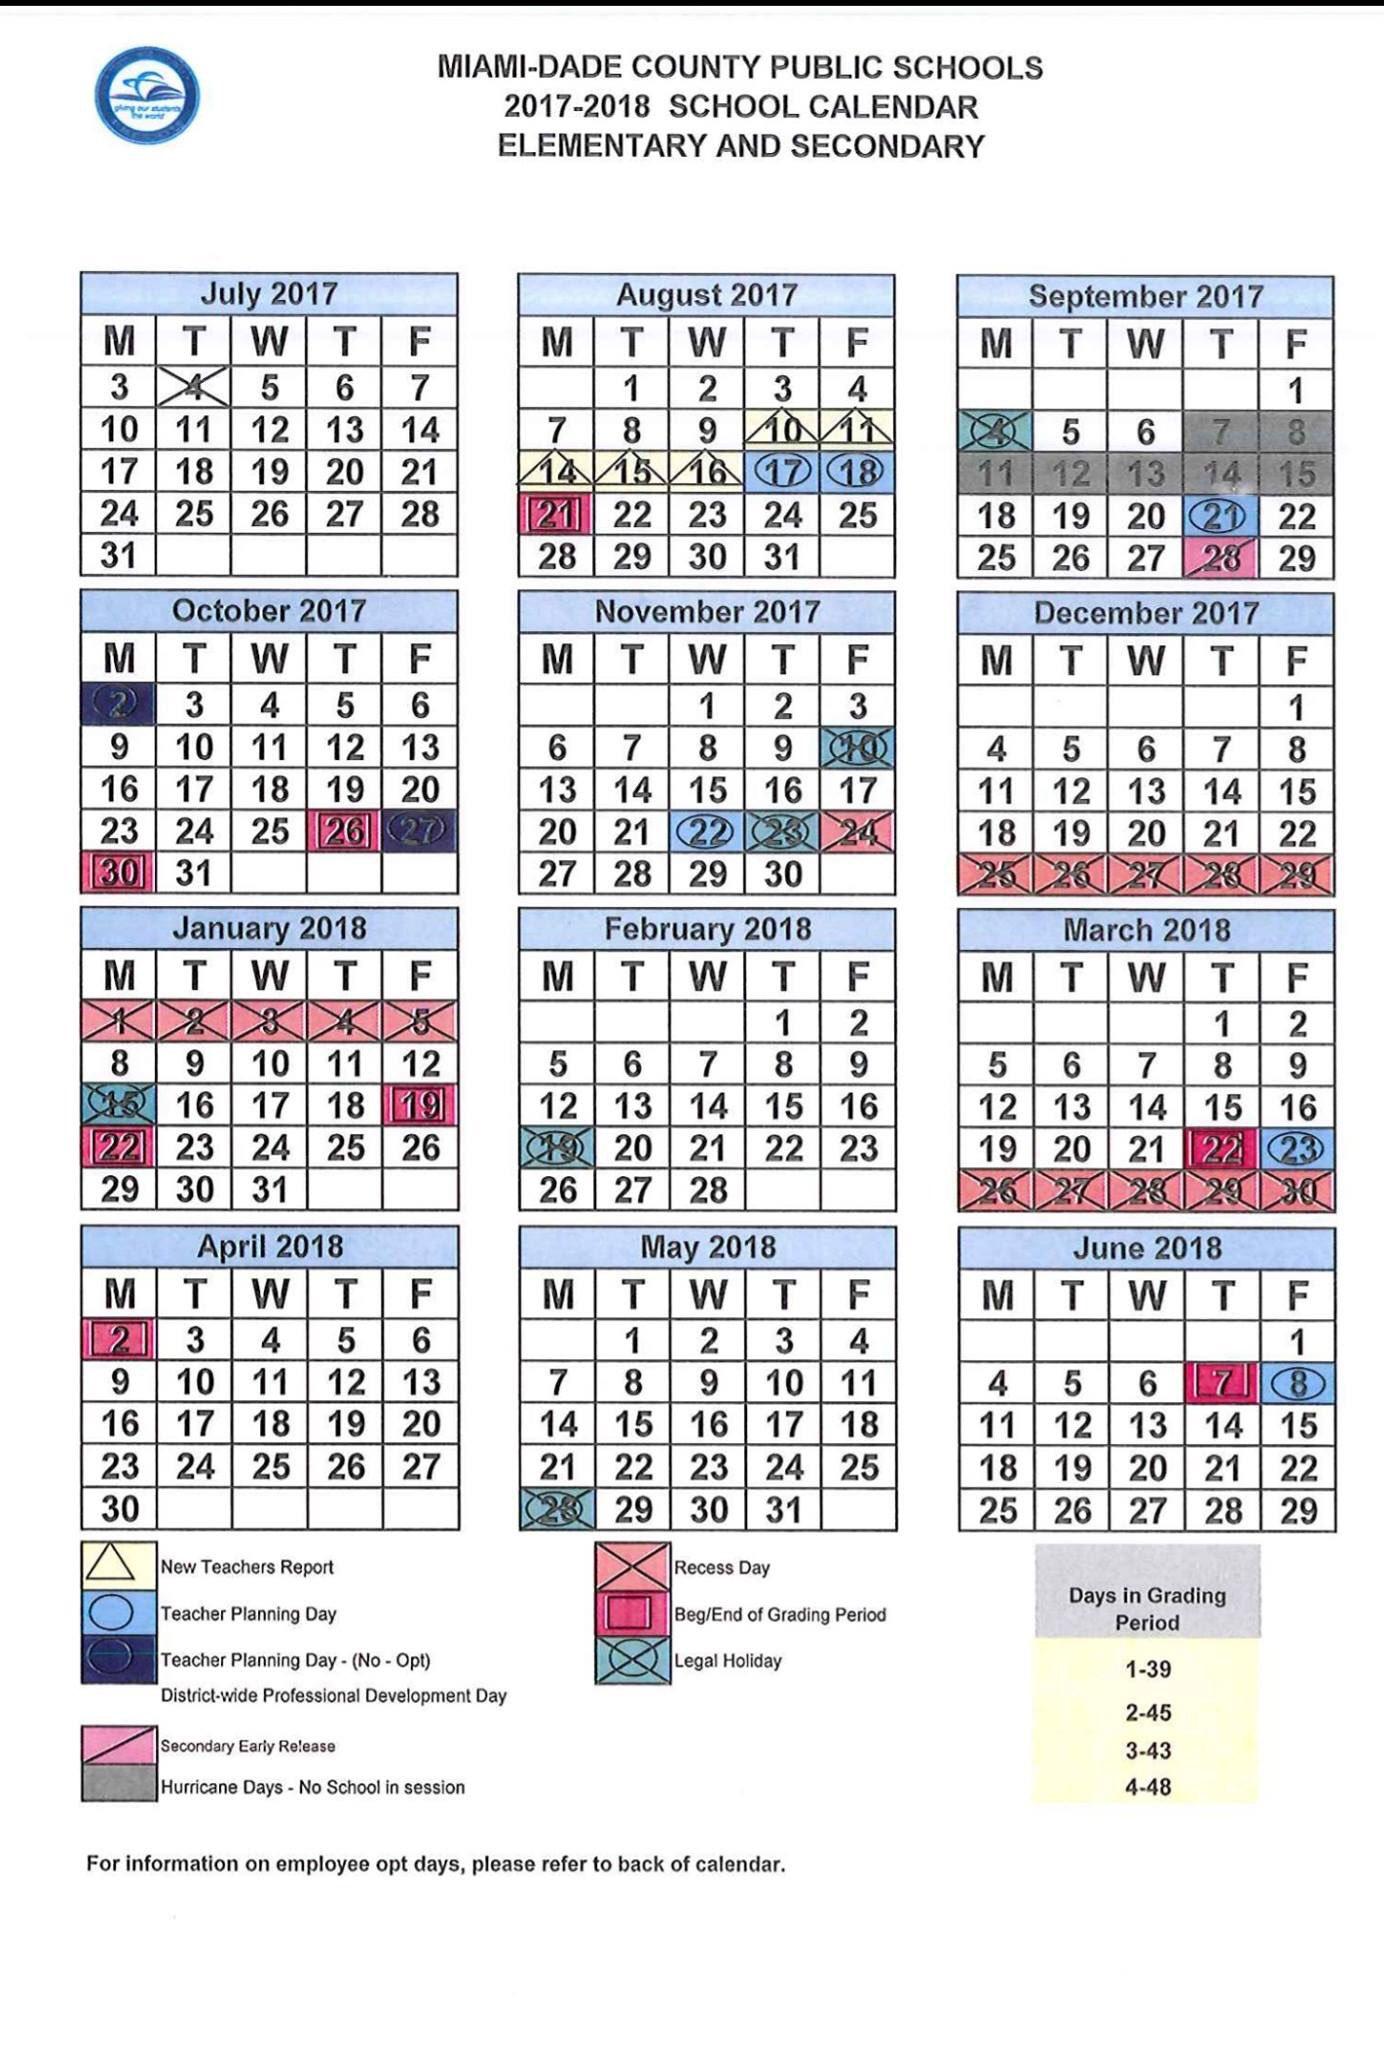 Mdcps Calendar 2022 23.South Miami K 8 On Twitter Revised School Calendar For 2017 2018 Mdcps